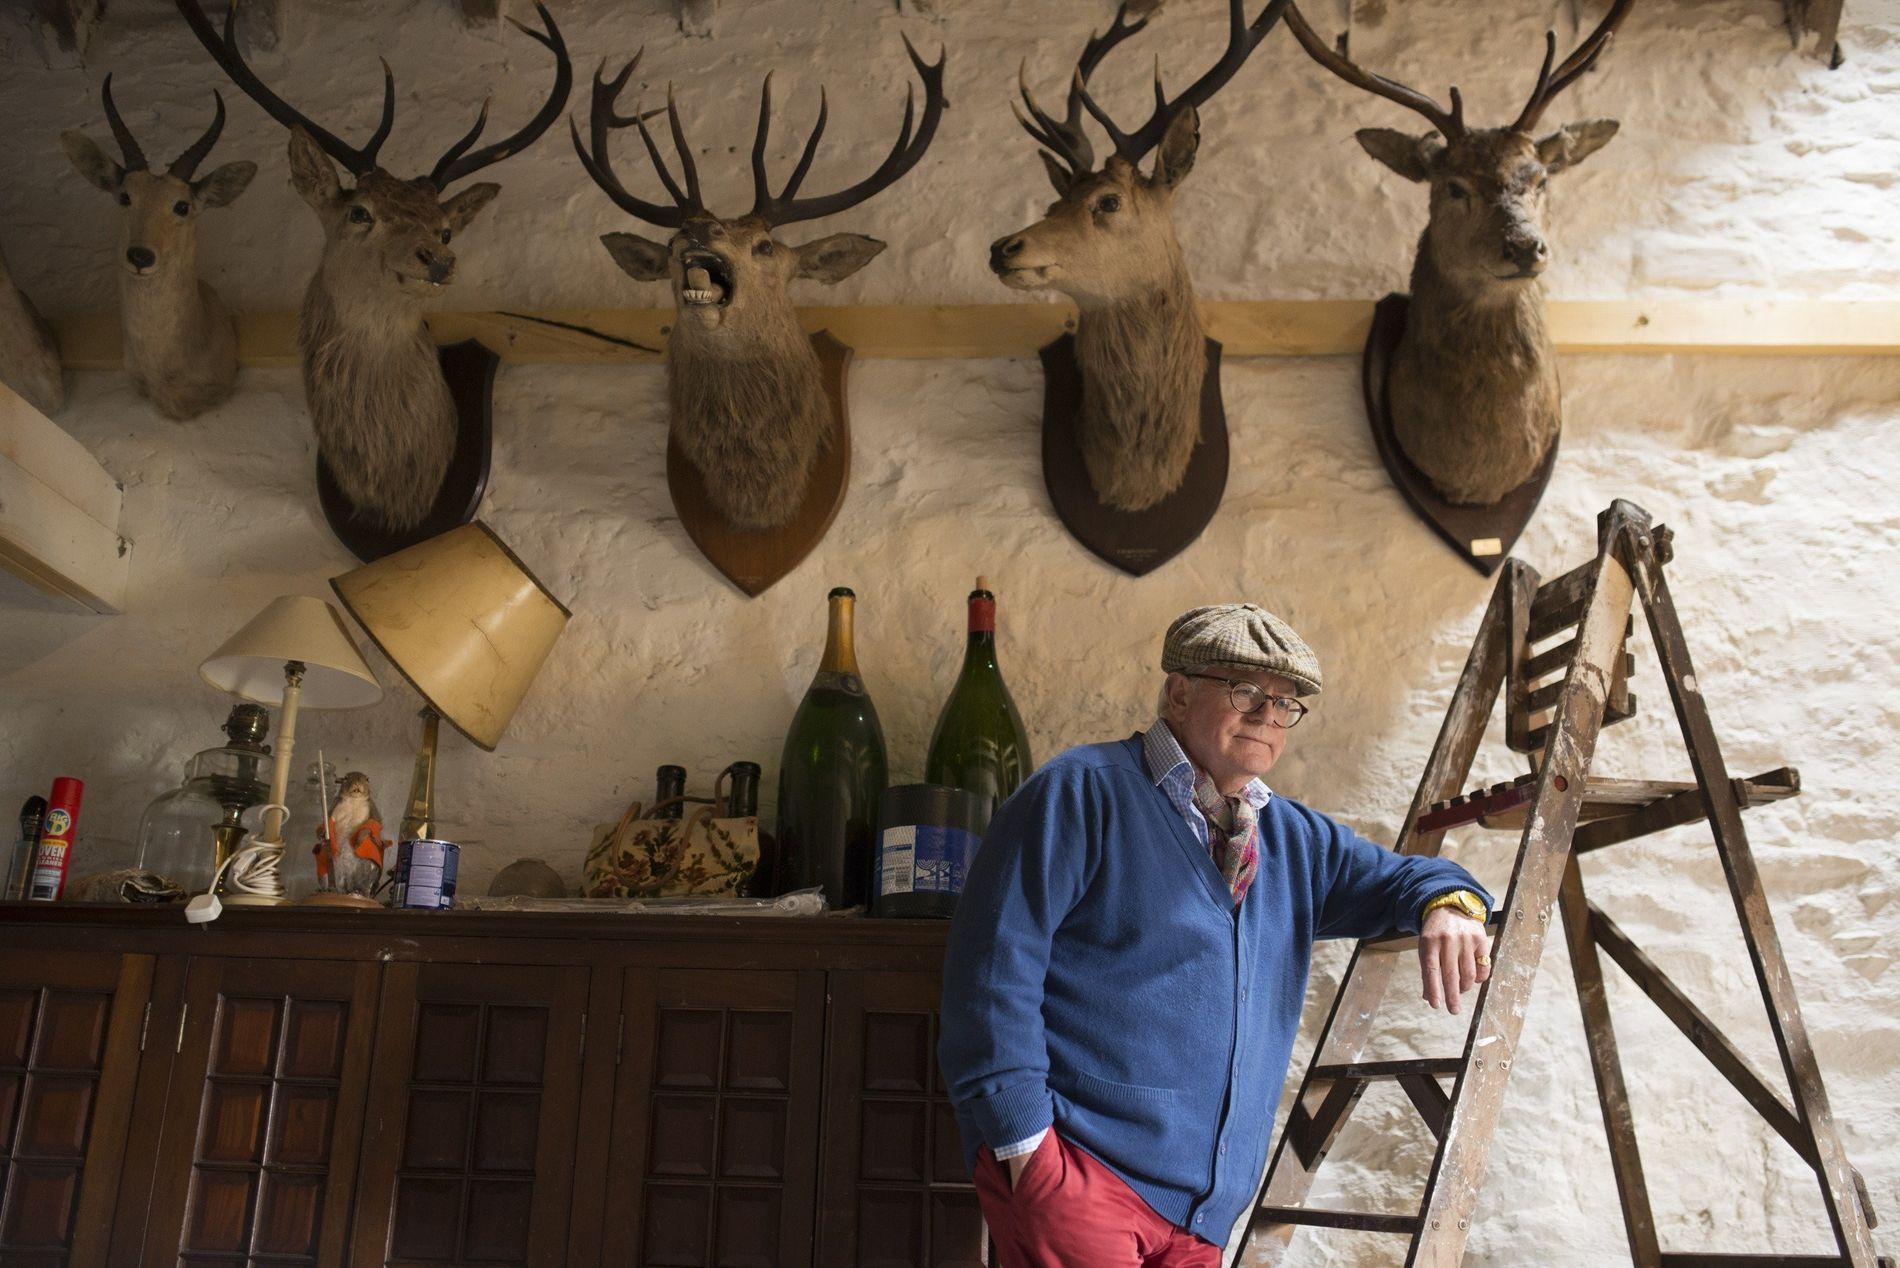 Allan Macpherson-Fletcher sold his estate, Balavil, to a Dutch entrepreneur in 2015—no regrets.